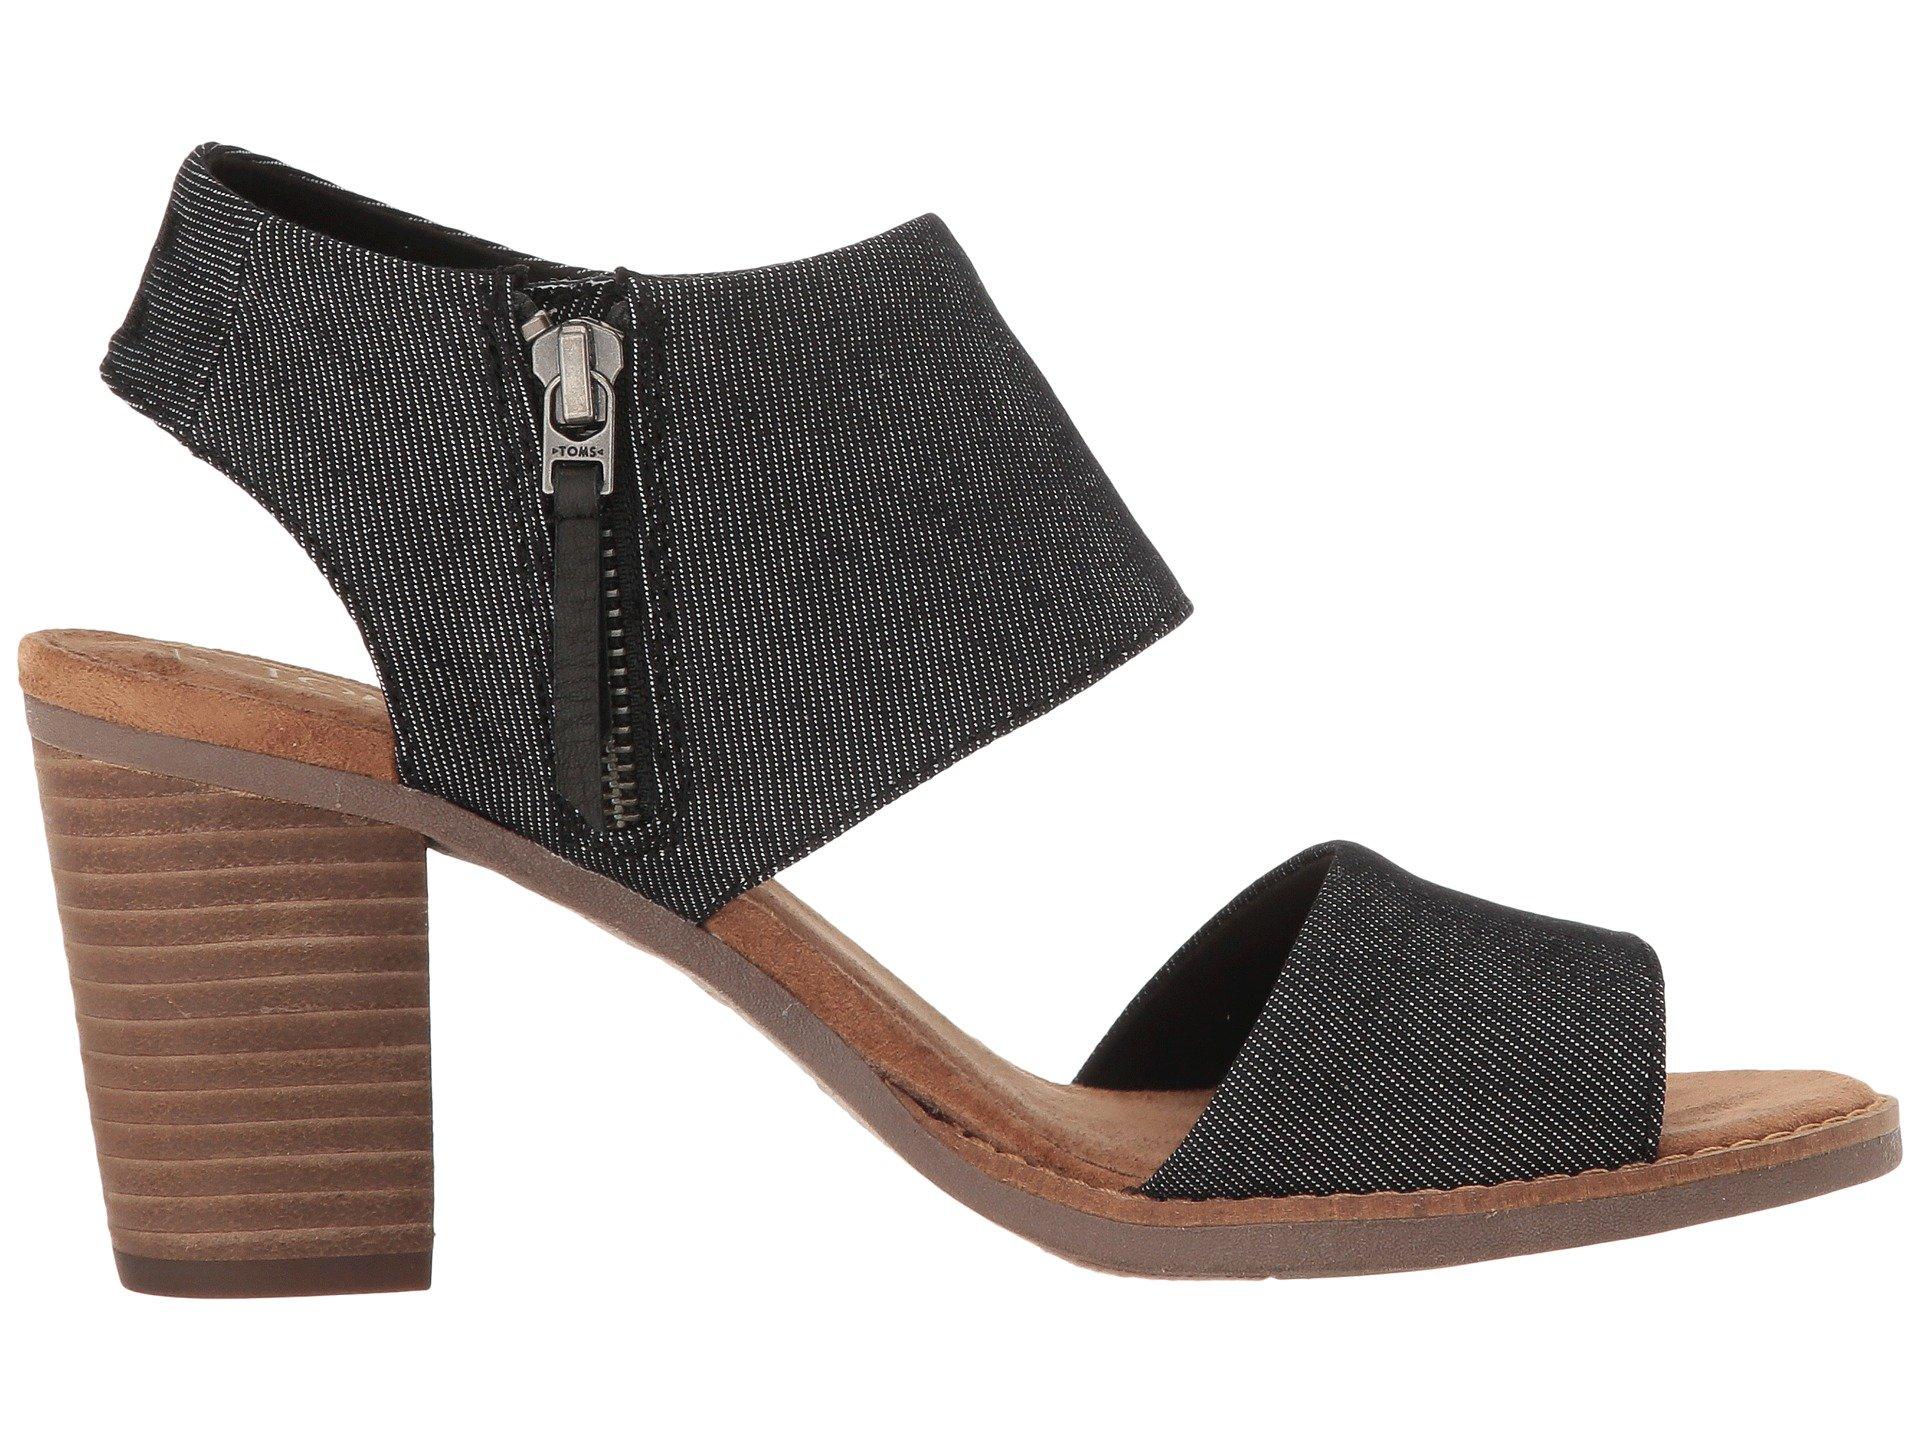 Toms Majorca Cutout Sandal At Zappos Com